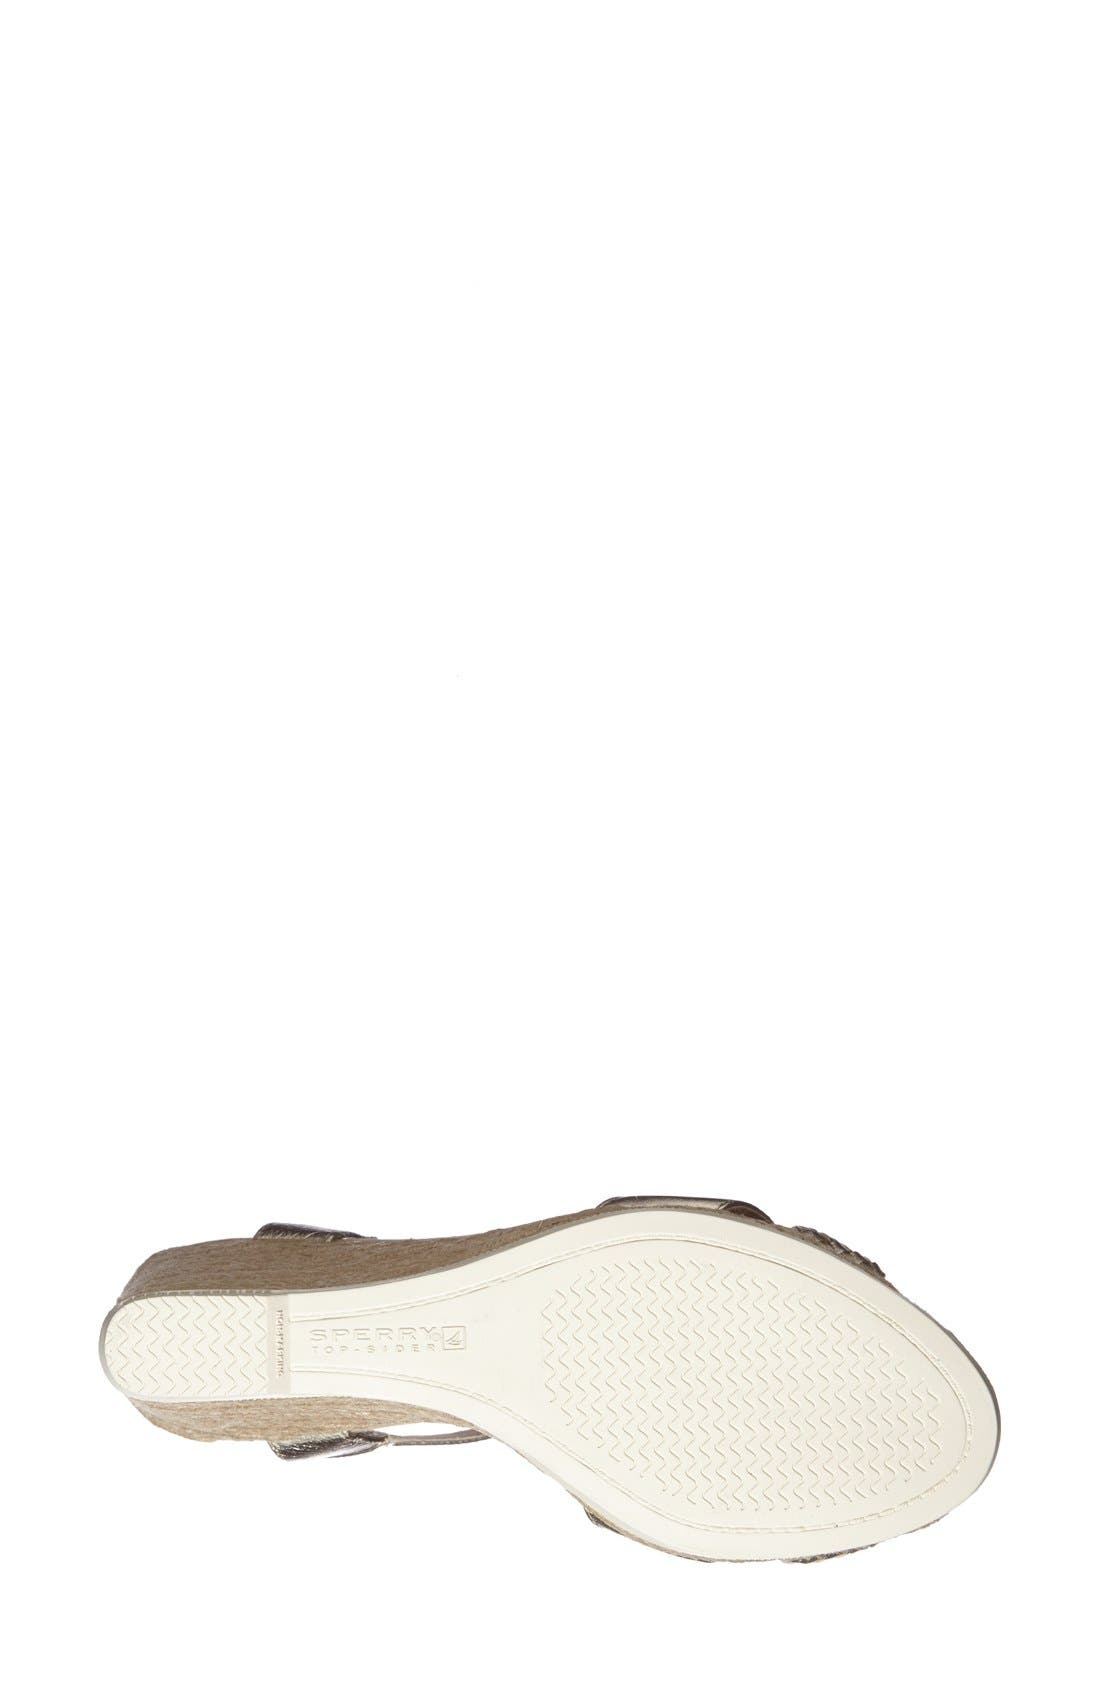 Alternate Image 4  - Sperry Top-Sider® 'Saylor' Wedge Sandal (Women)